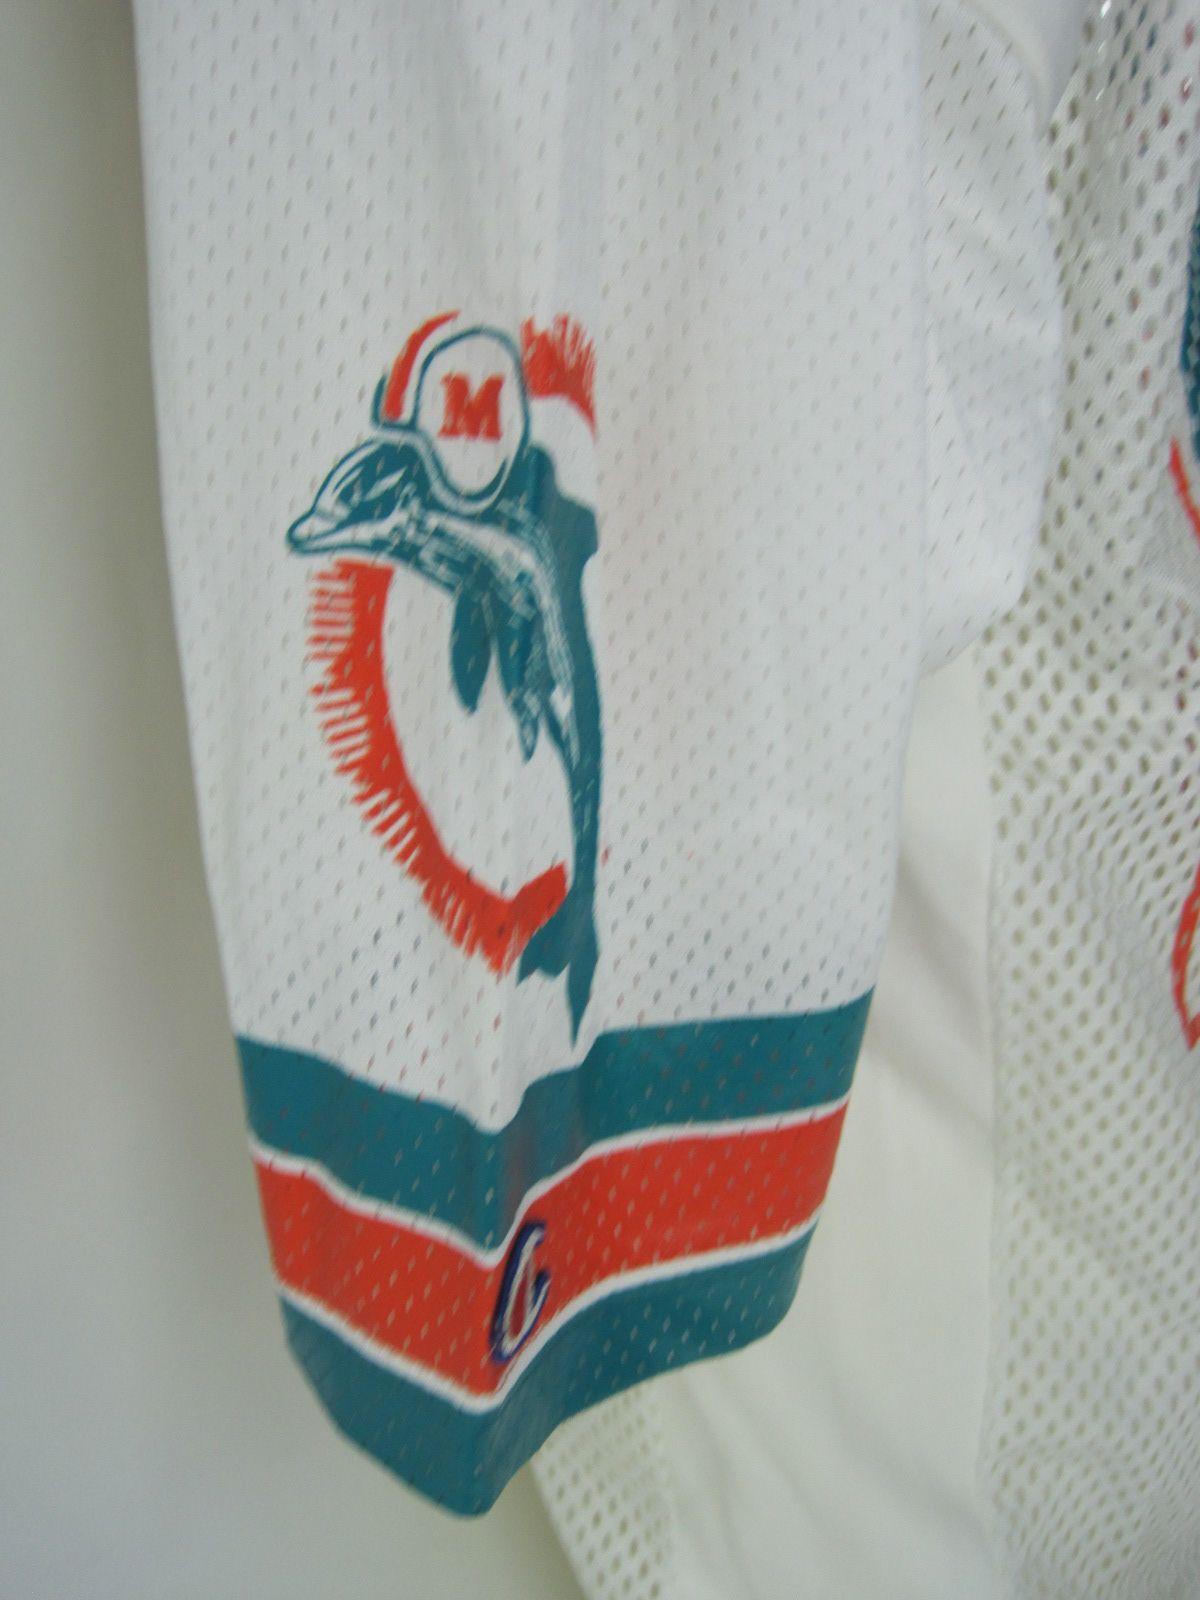 new product 360e4 46a64 Lot Detail - Dan Marino mid 1980's Miami Dolphins ...